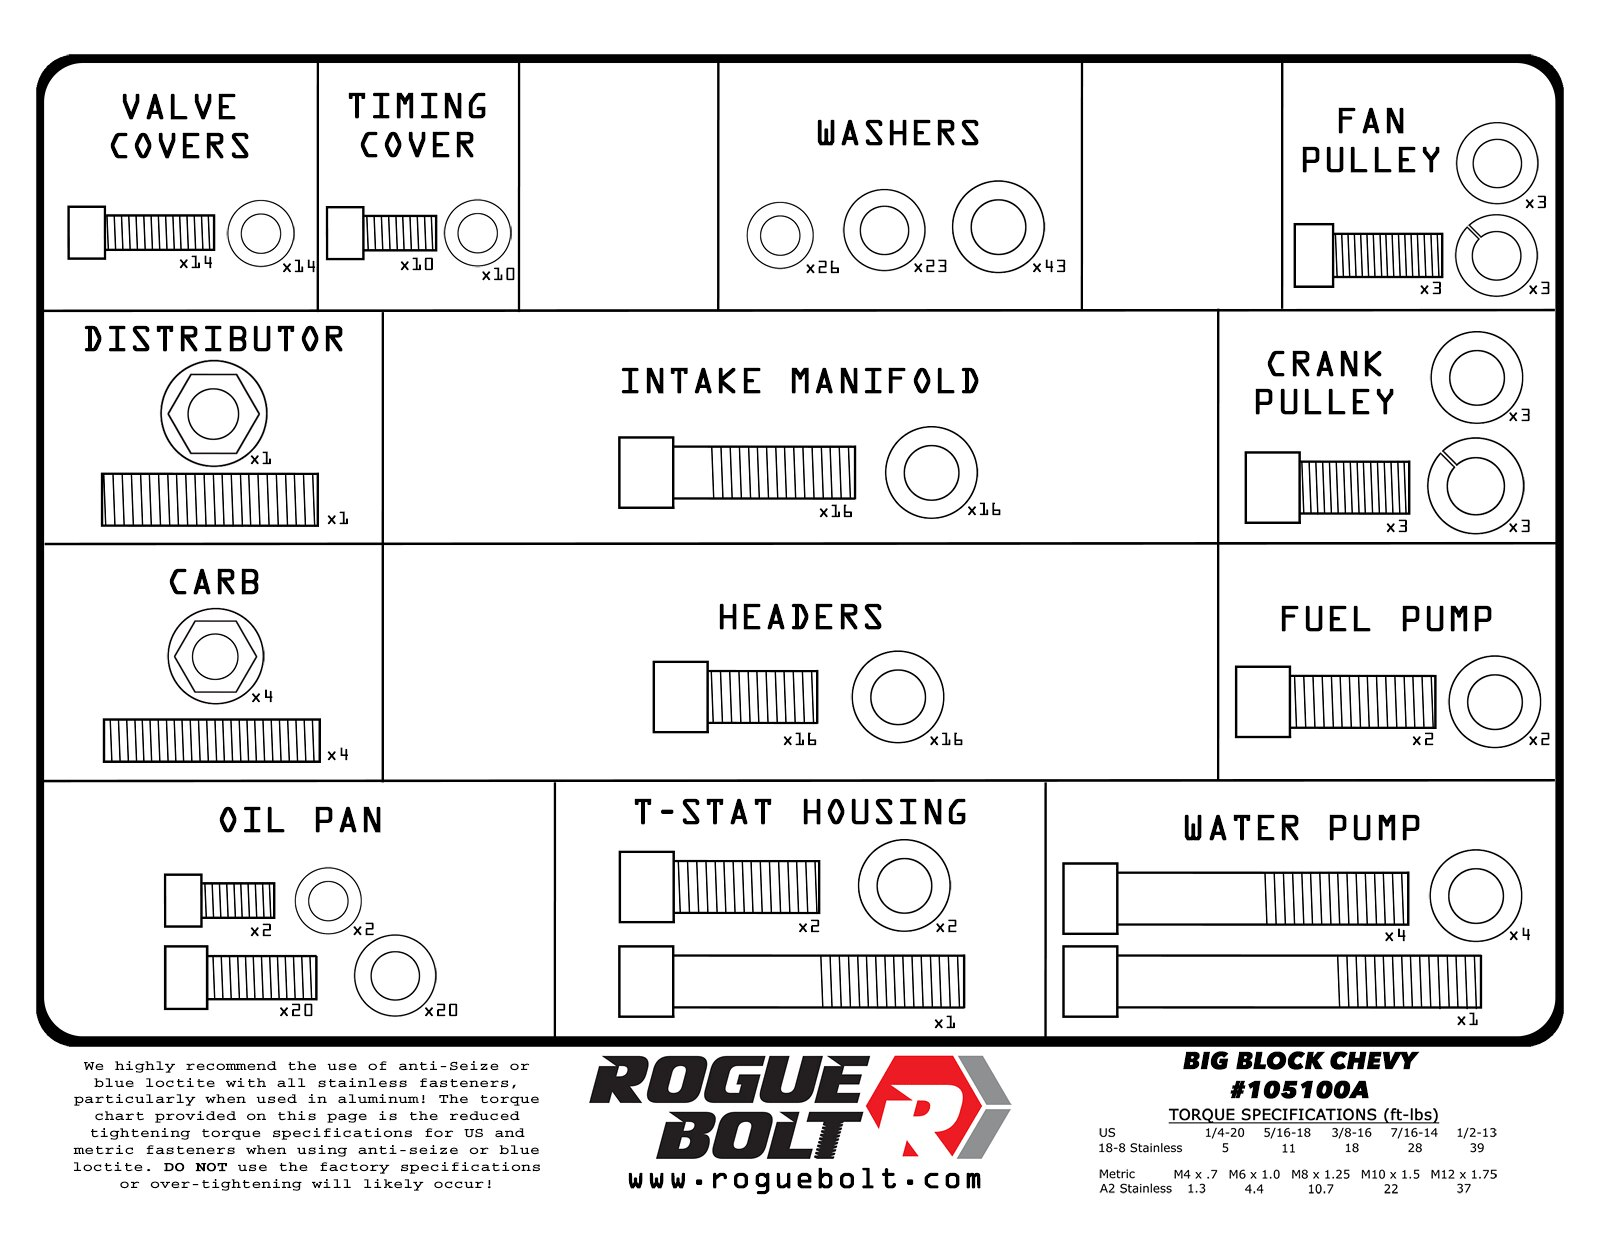 Big Block Chevy Head Torque Sequence Gtsparkplugs